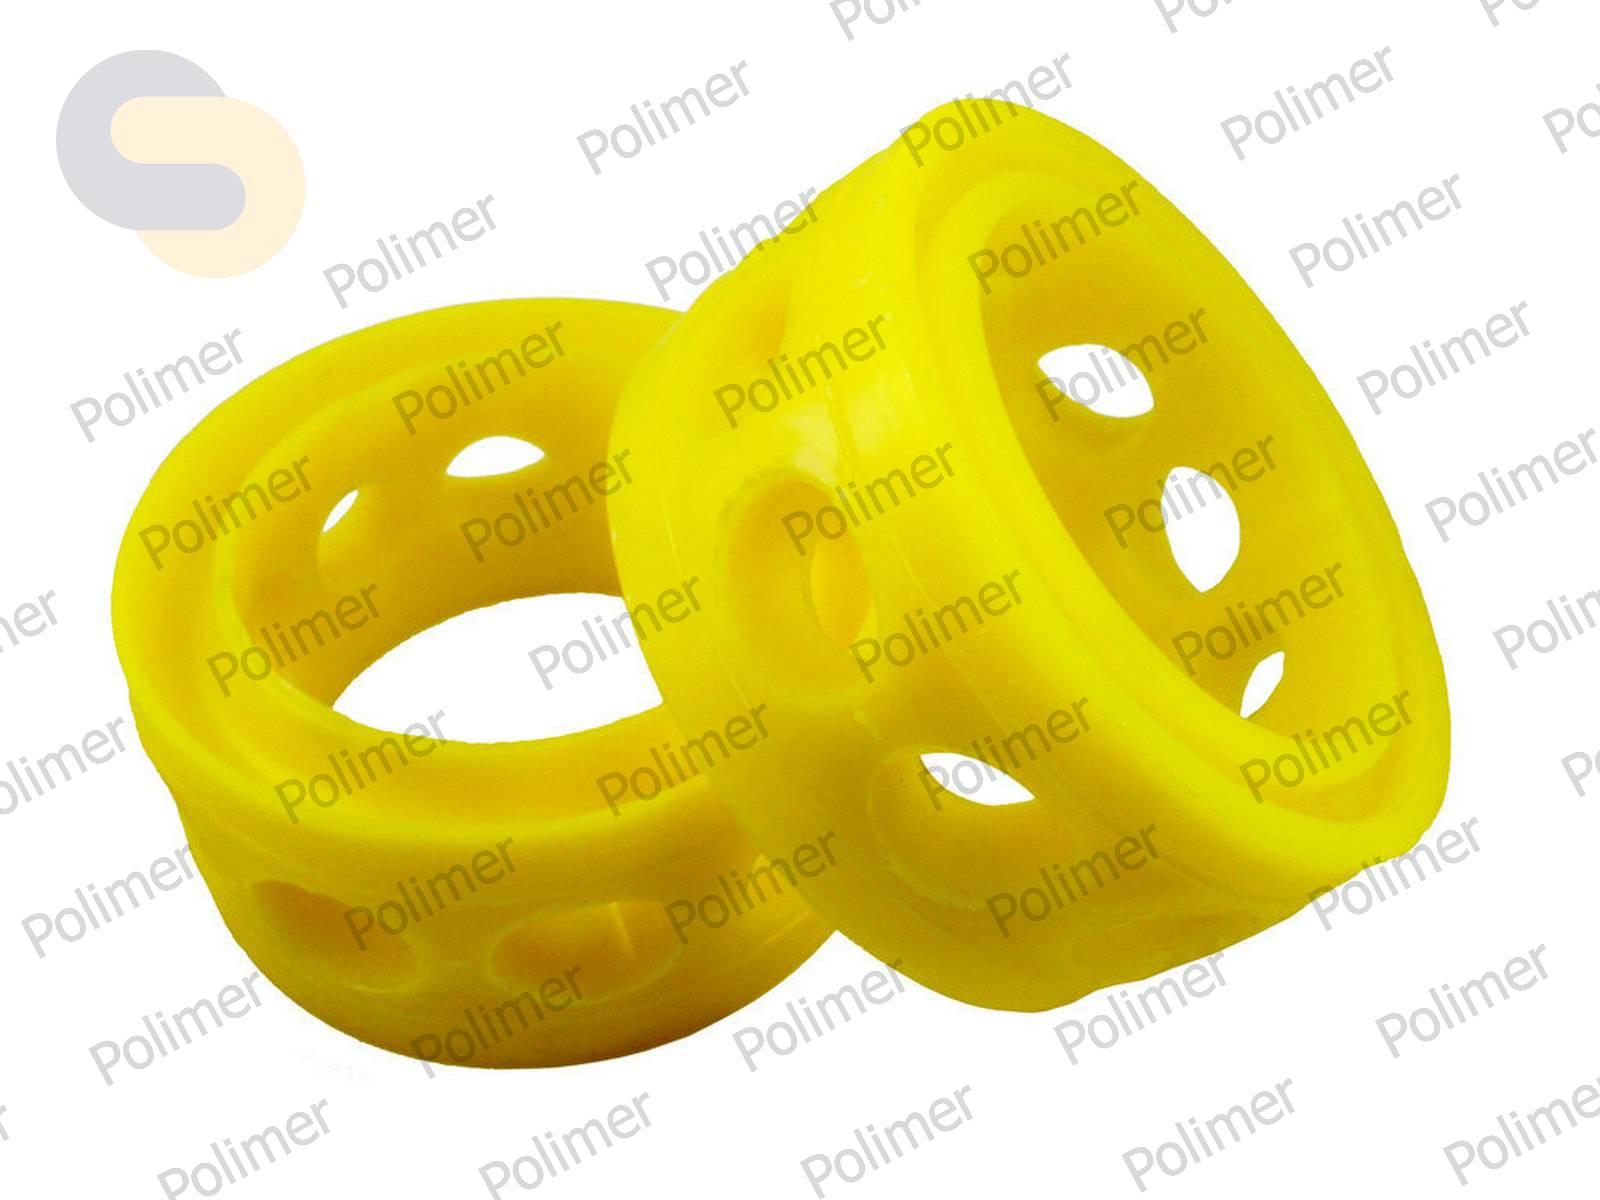 http://polimer-nsk.ru/web/pkl/Size-A-POLY.jpg